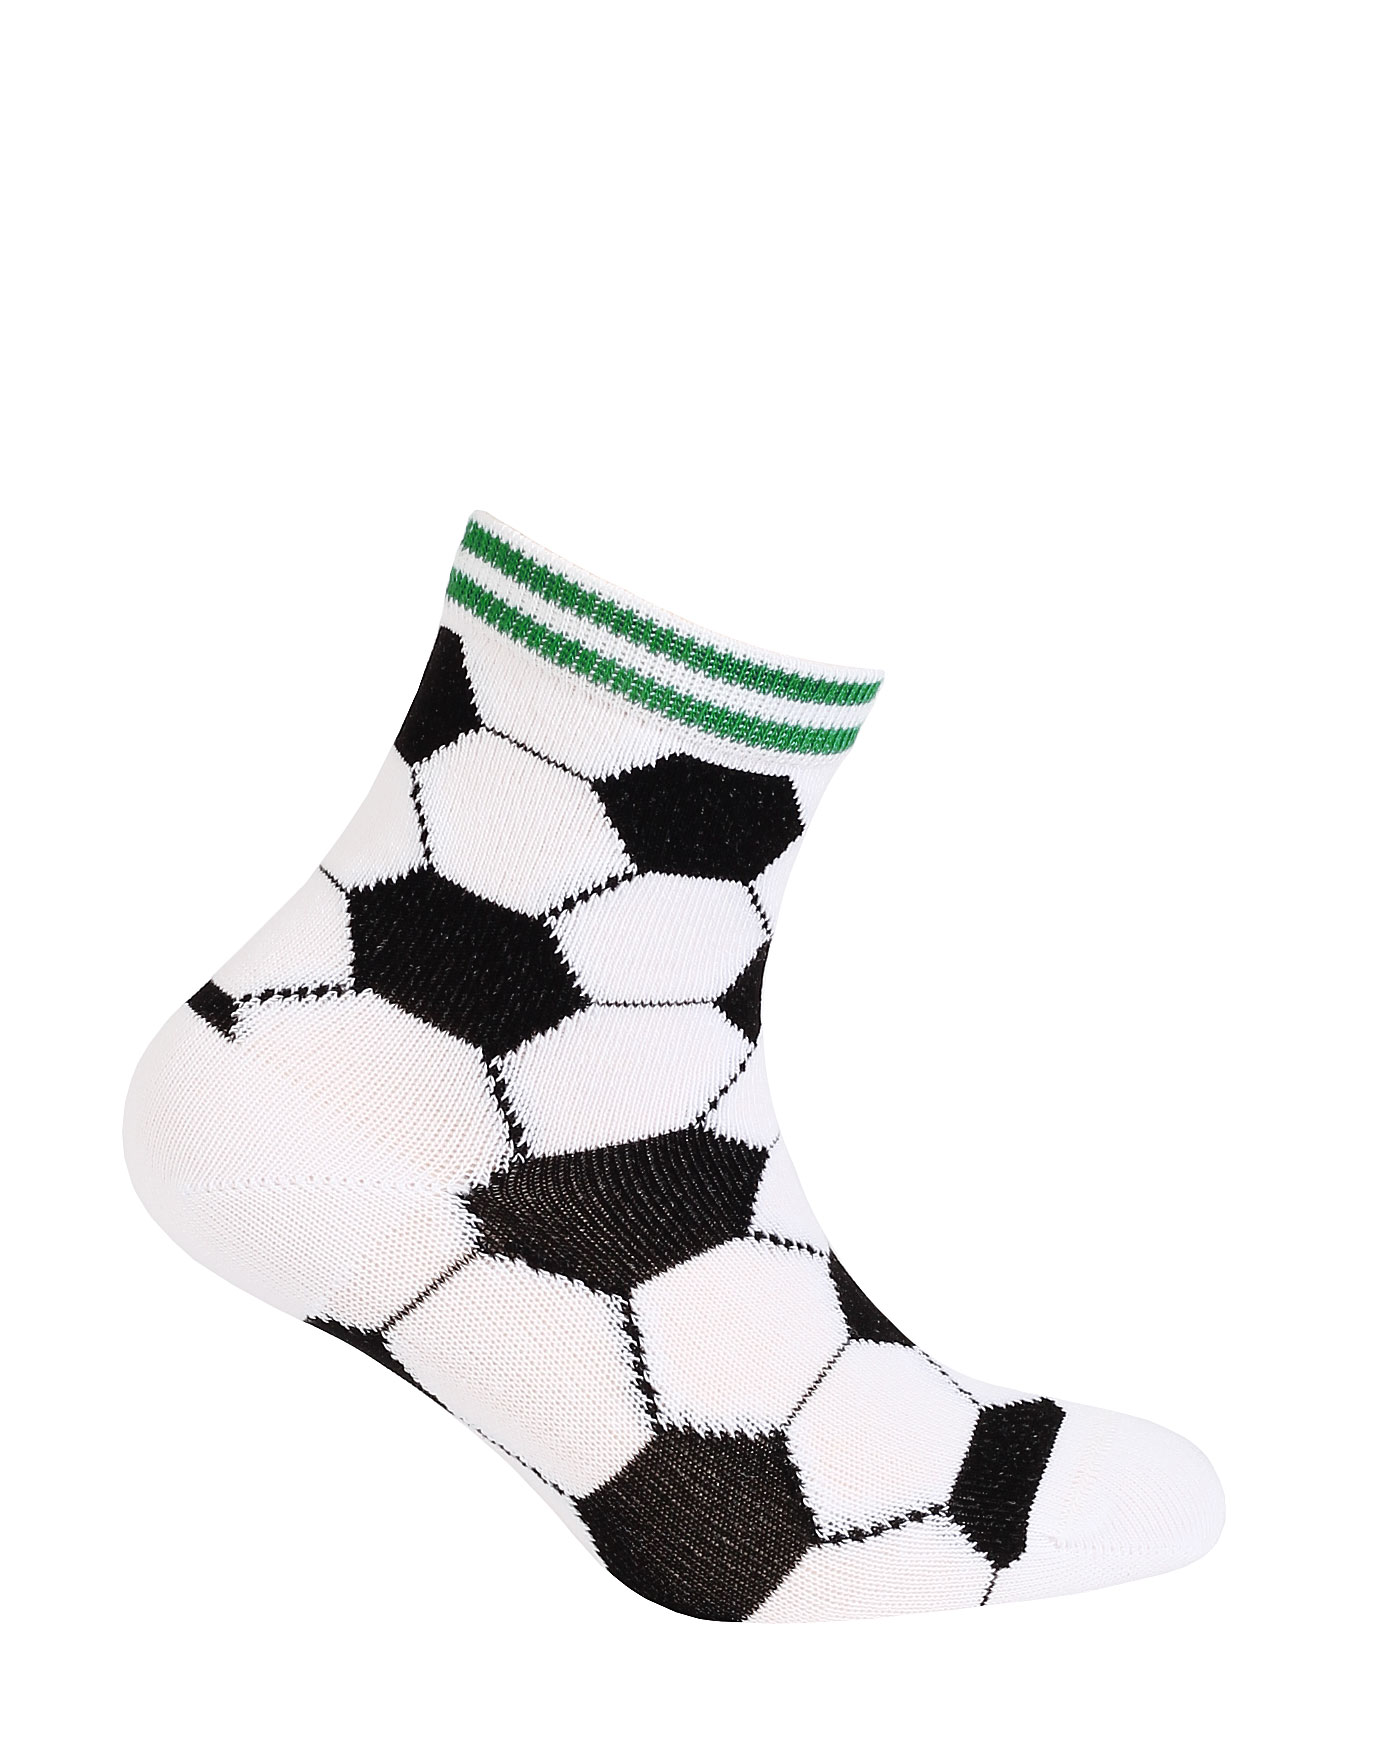 Chlapecké vzorované ponožky WOLA FOTBALOVÉ MÍČE bílé Velikost: 21-23